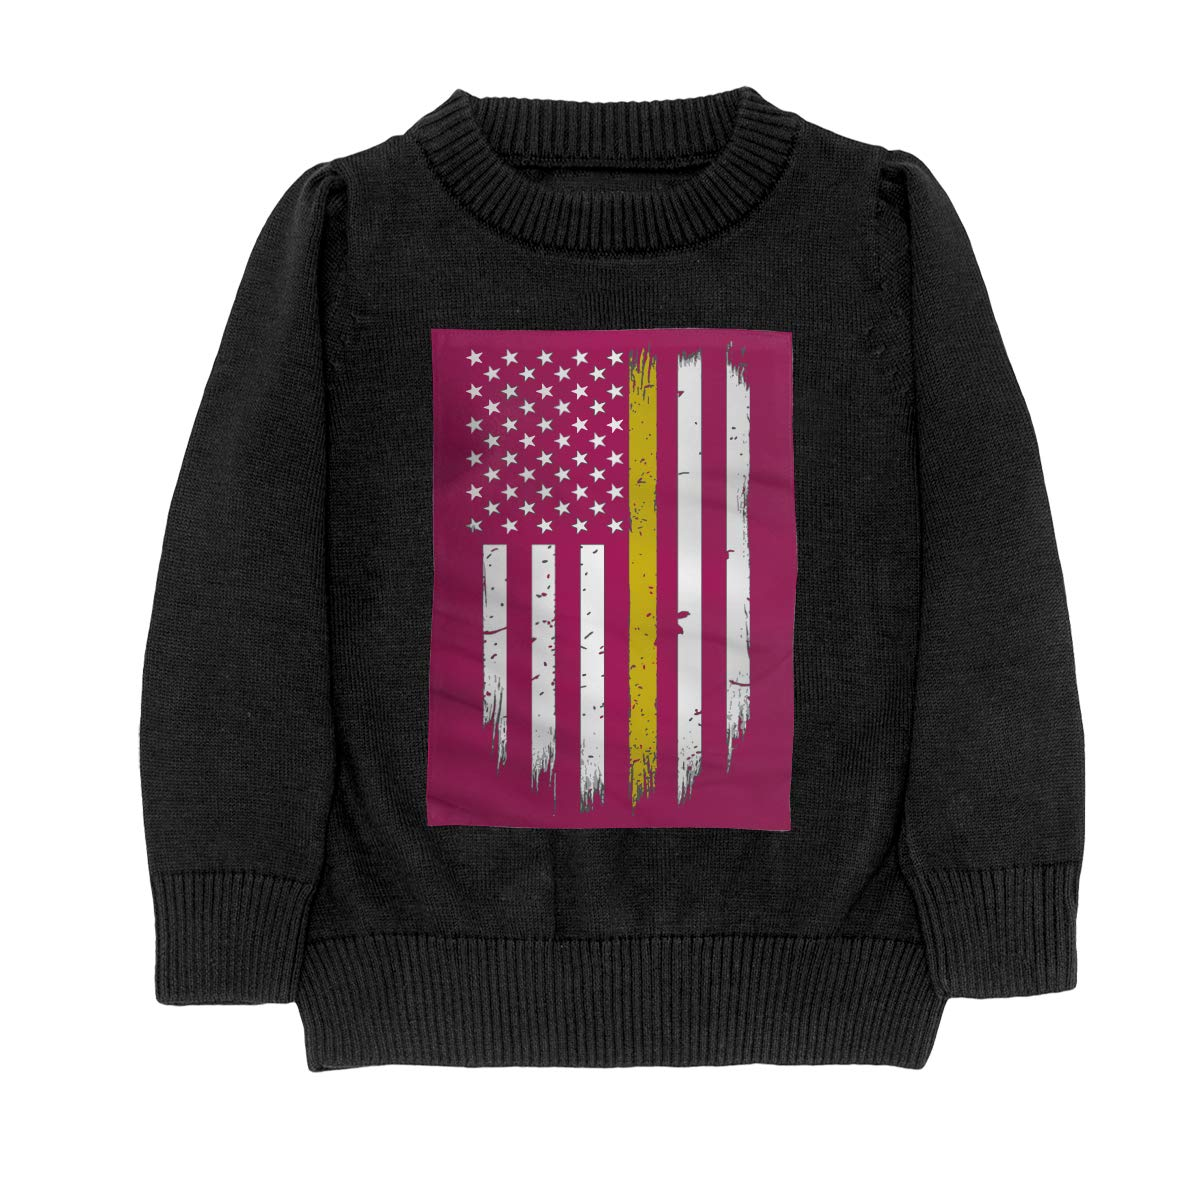 WWTBBJ-B 911 Dispatcher Thin Gold Line Casual Adolescent Boys Girls Unisex Sweater Keep Warm